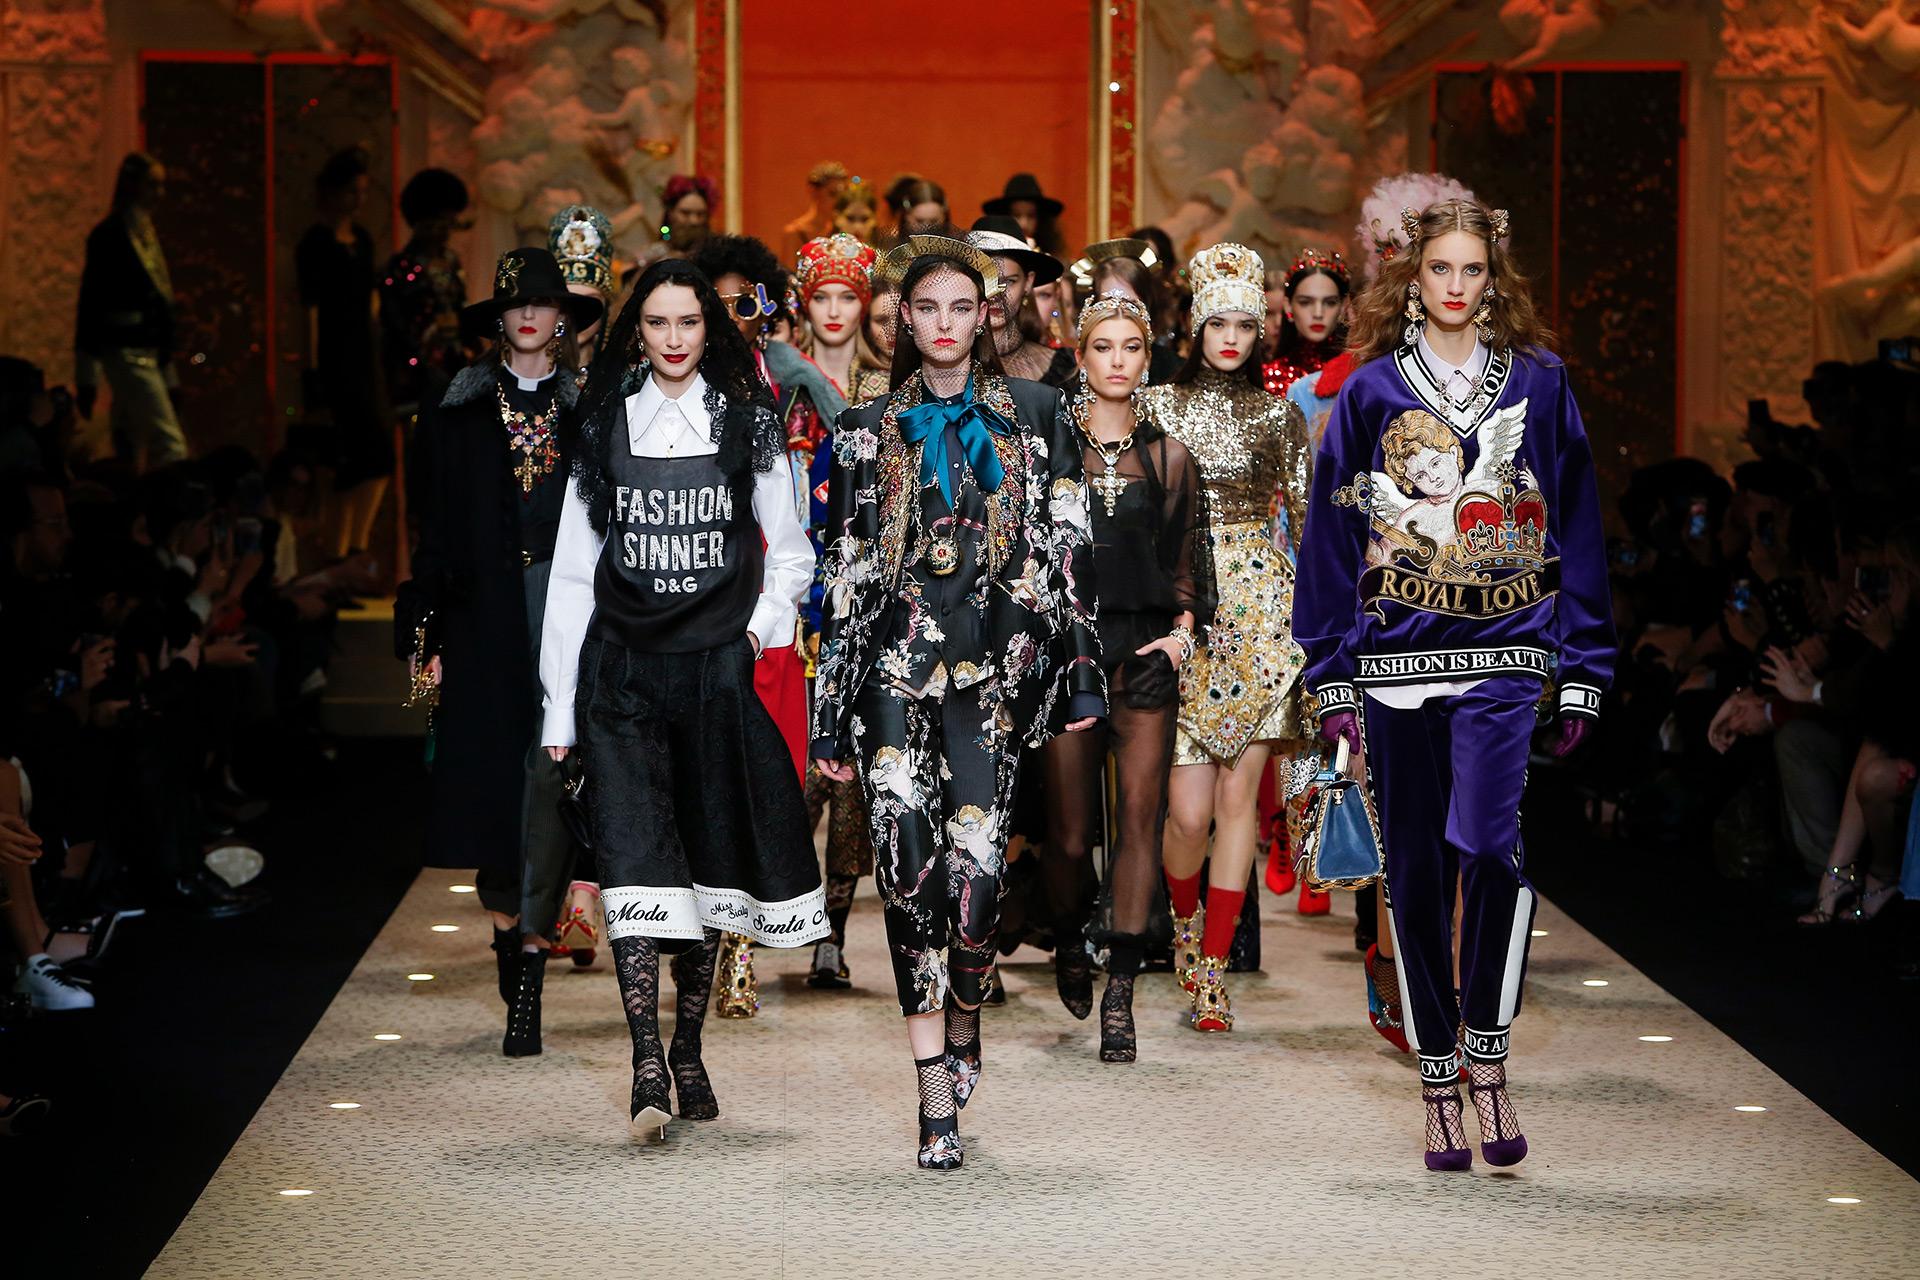 dolce-and-gabbana-fall-winter-2018-19-women-fashion-show-runway-111.jpg